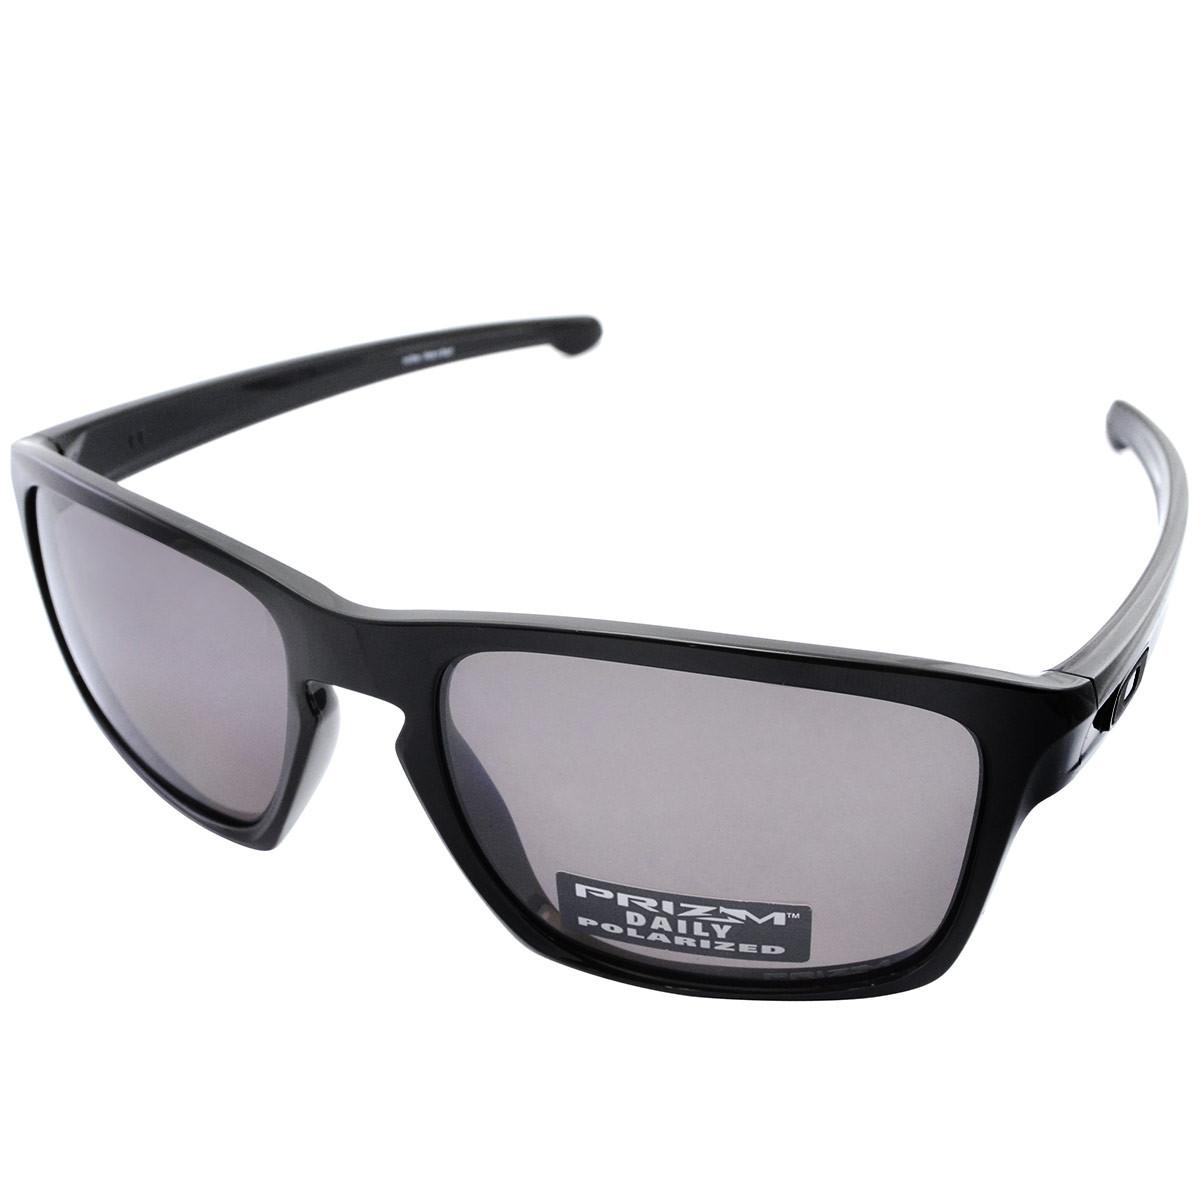 97353922efd65 Óculos Oakley Sliver Polished Black Lente Prizm Black Polarizado ref ...